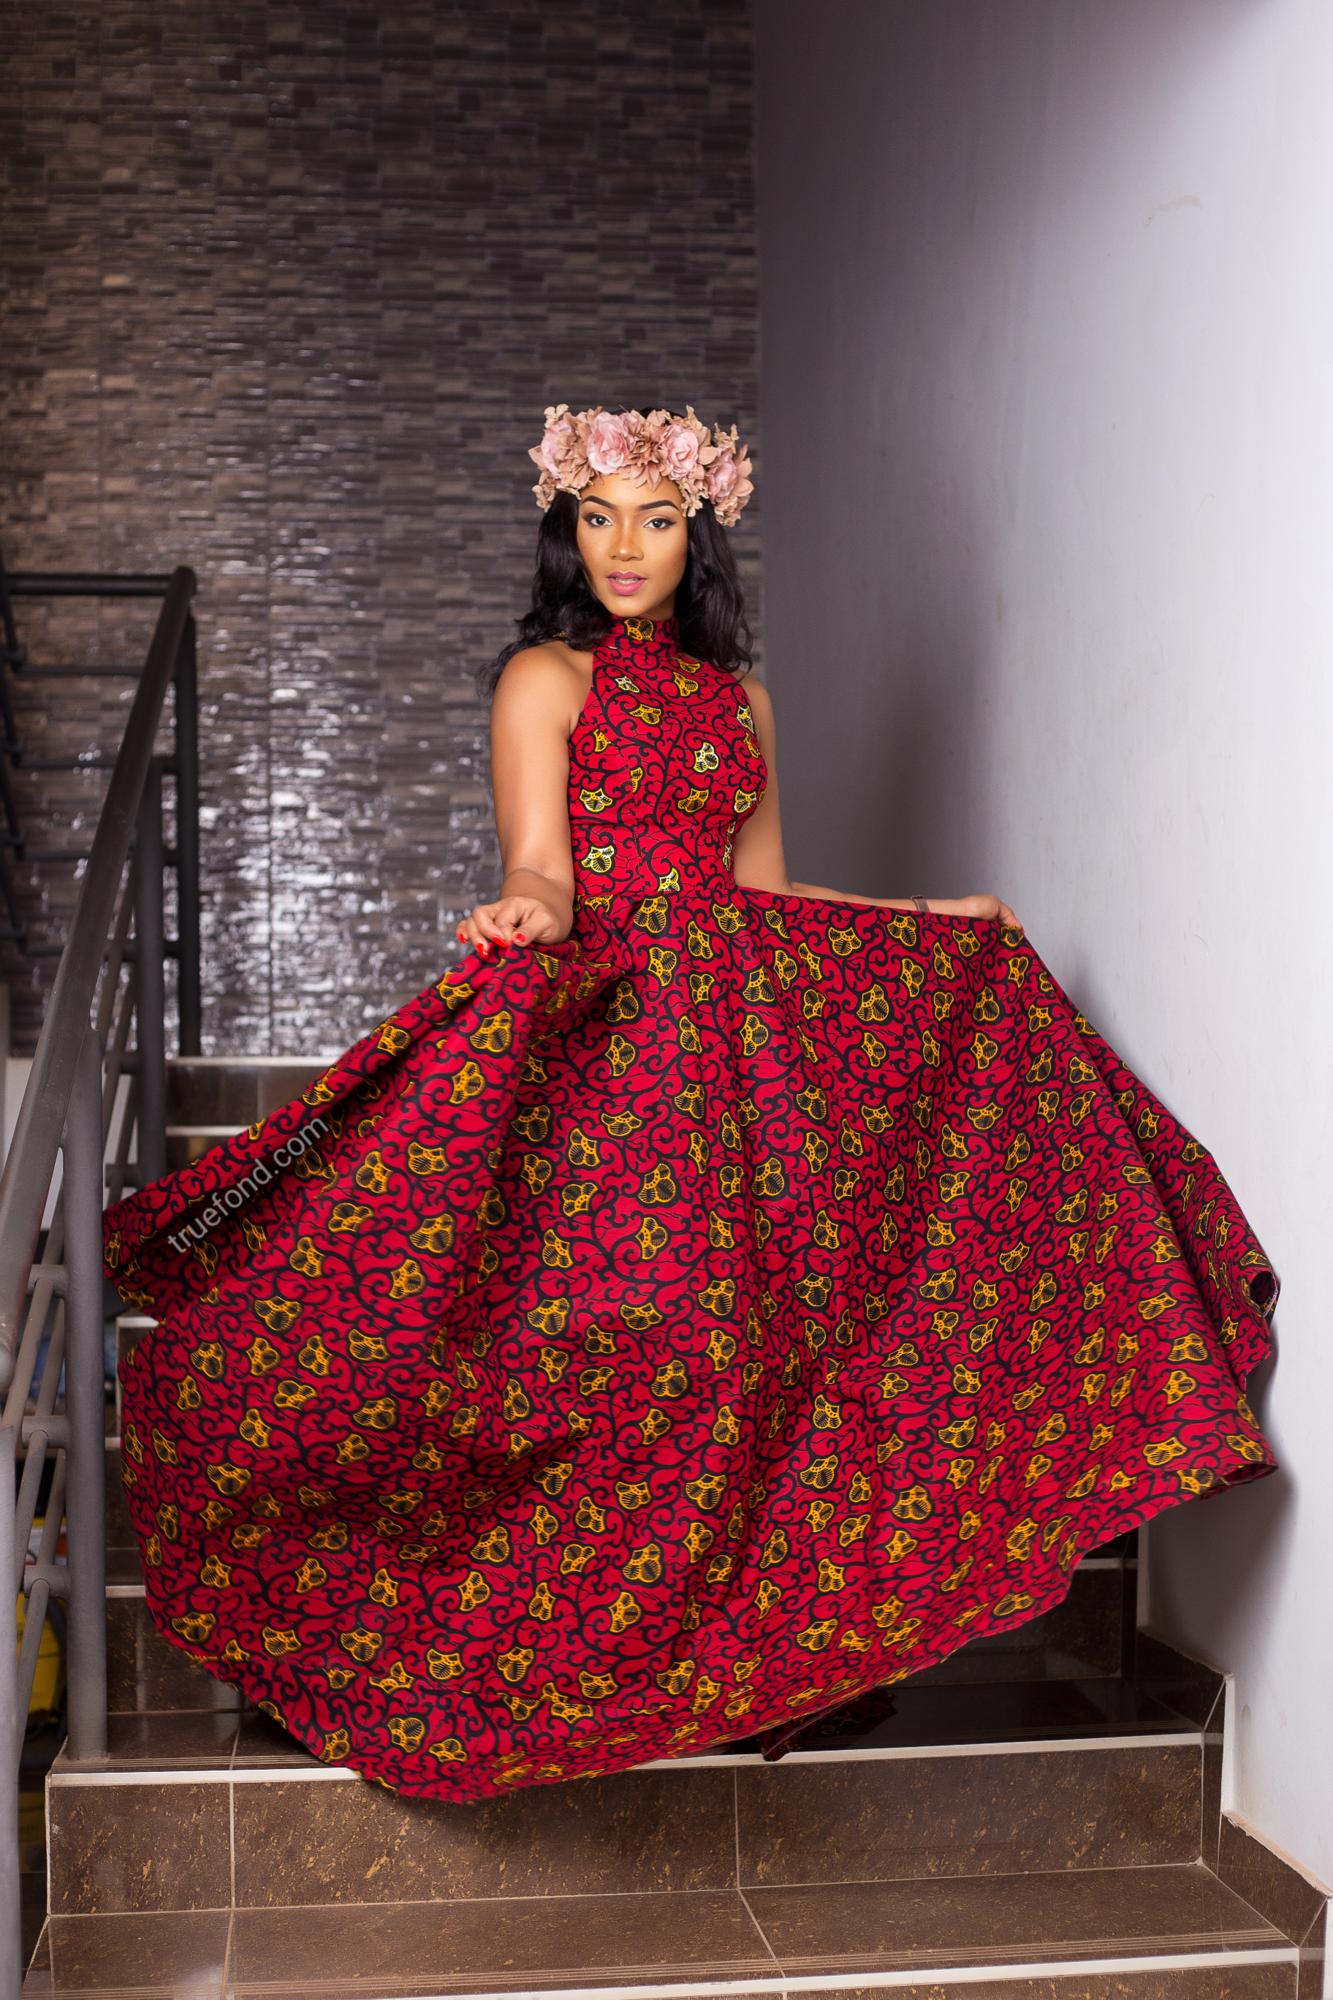 African Maxi Dress for Women Ankara clothing Ankara apparel Ankara Clothing,Ankara designs